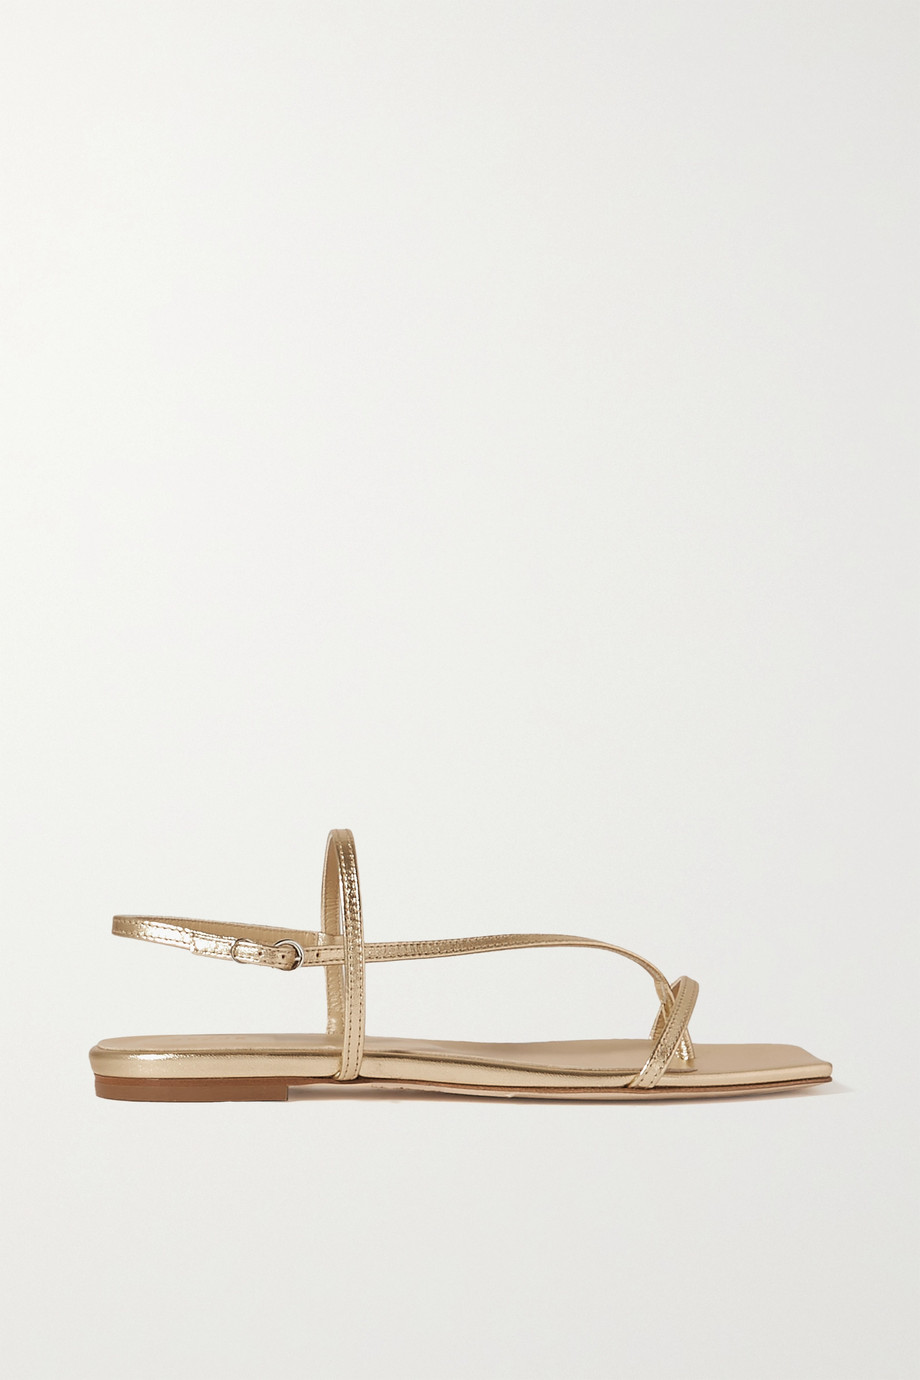 aeyde Ella metallic leather slingback sandals